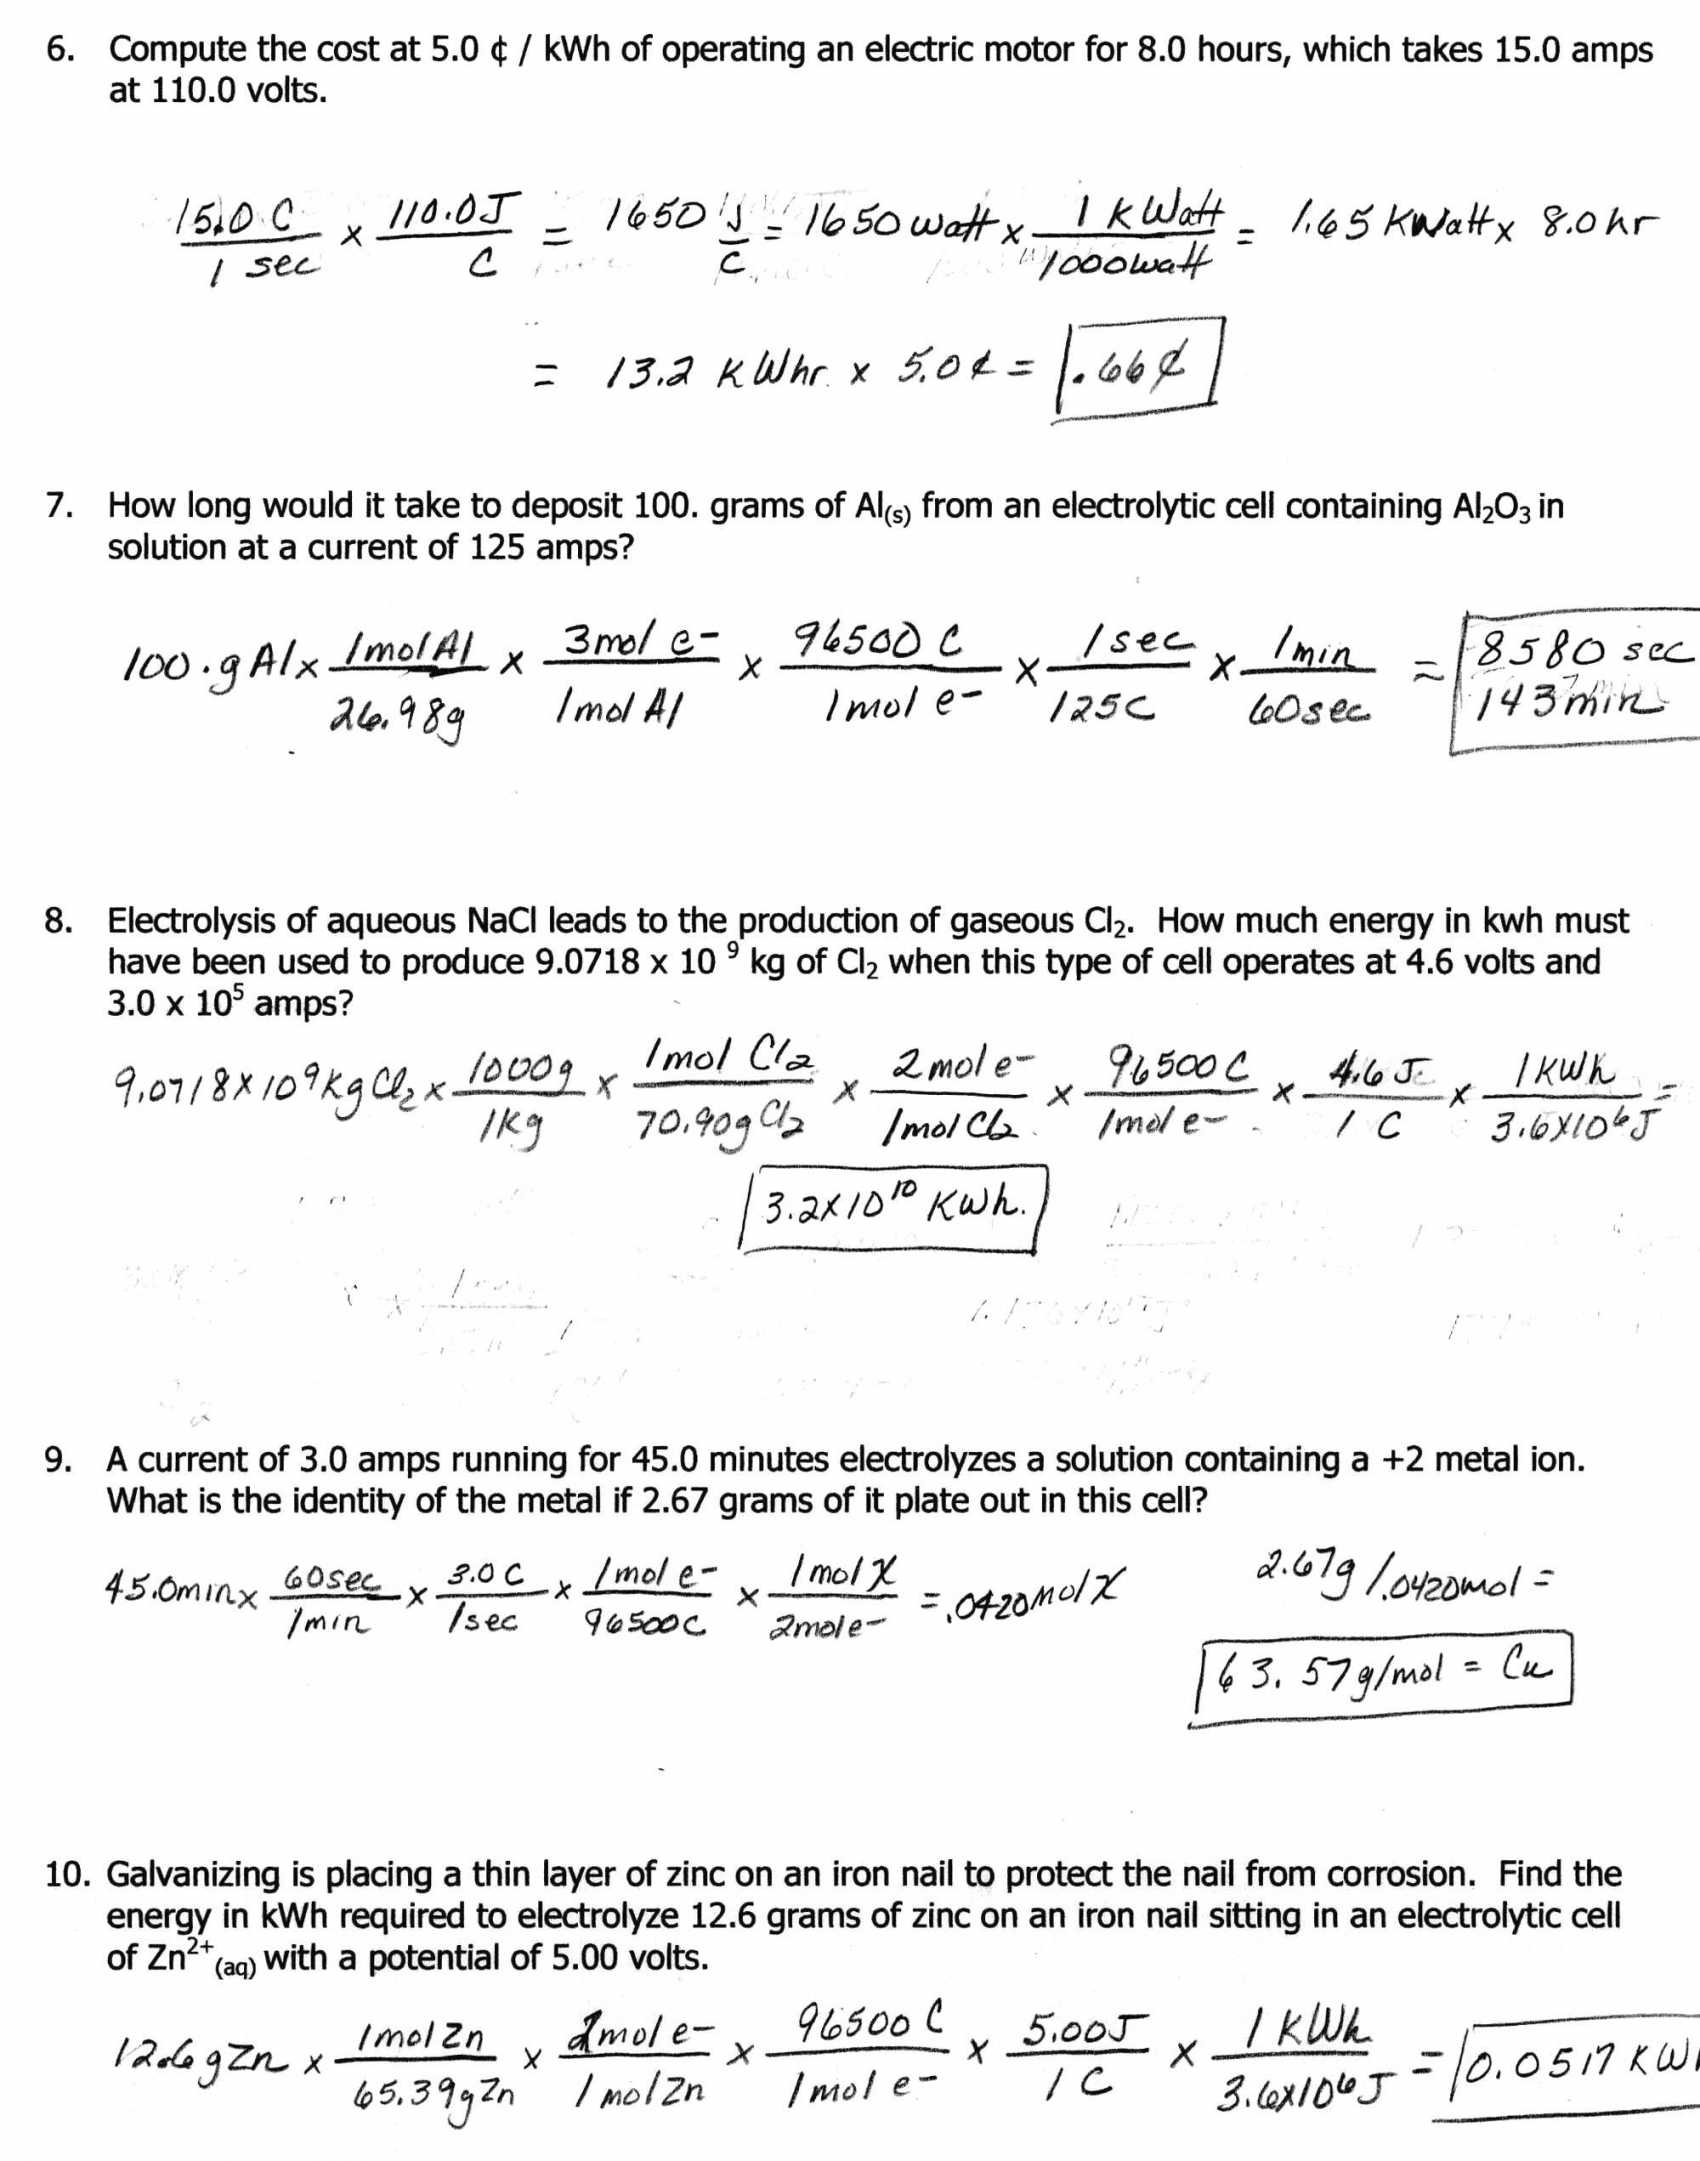 Worksheet Mole Mass Problems With Calculating Molar Mass